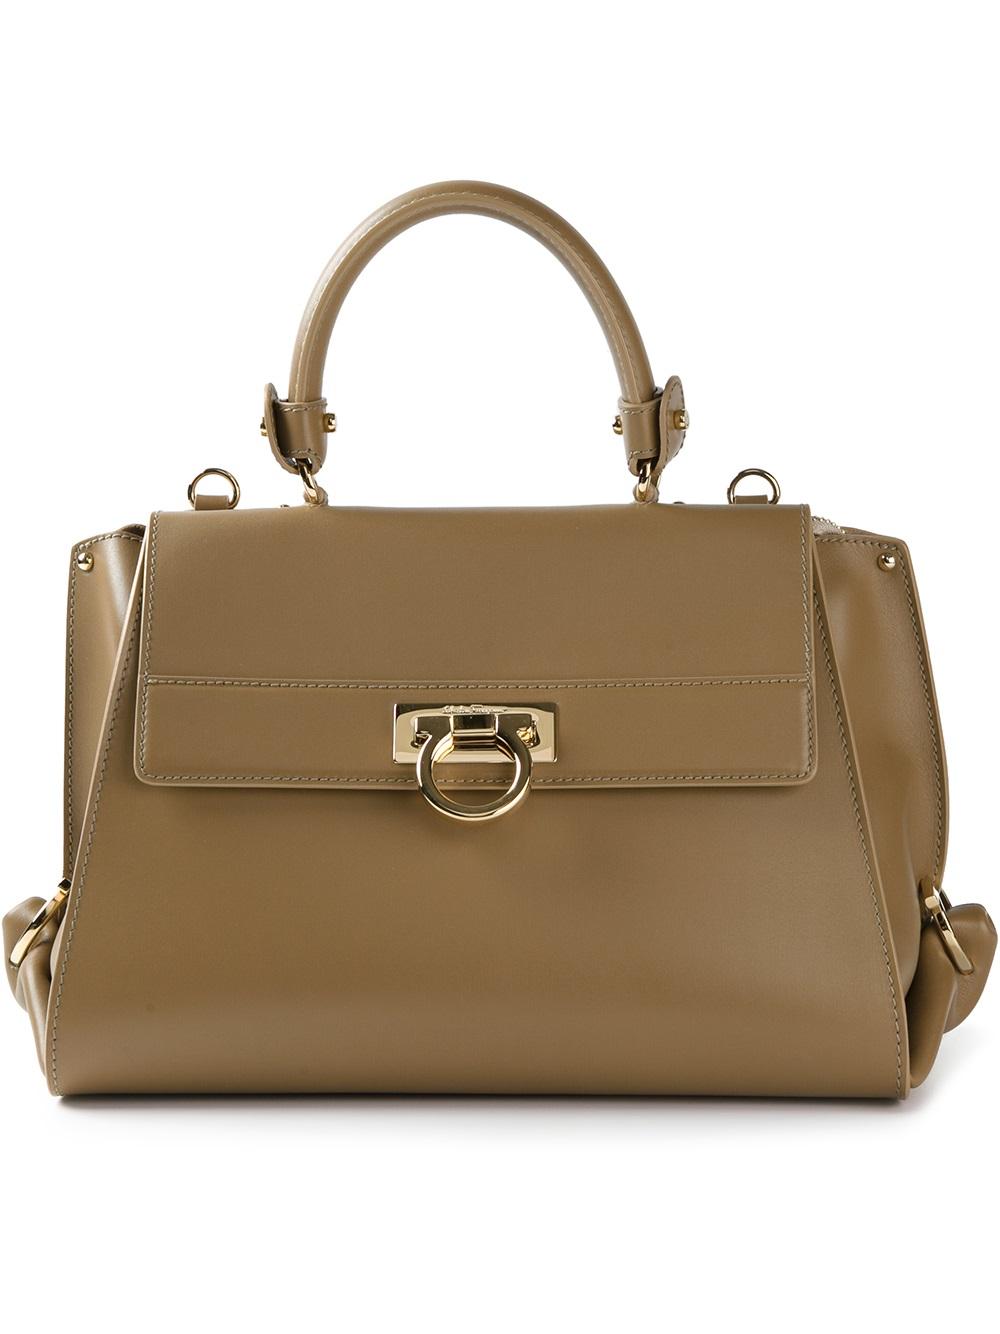 New Markdowns: Ferragamo Bags & Accessories | In Our ...